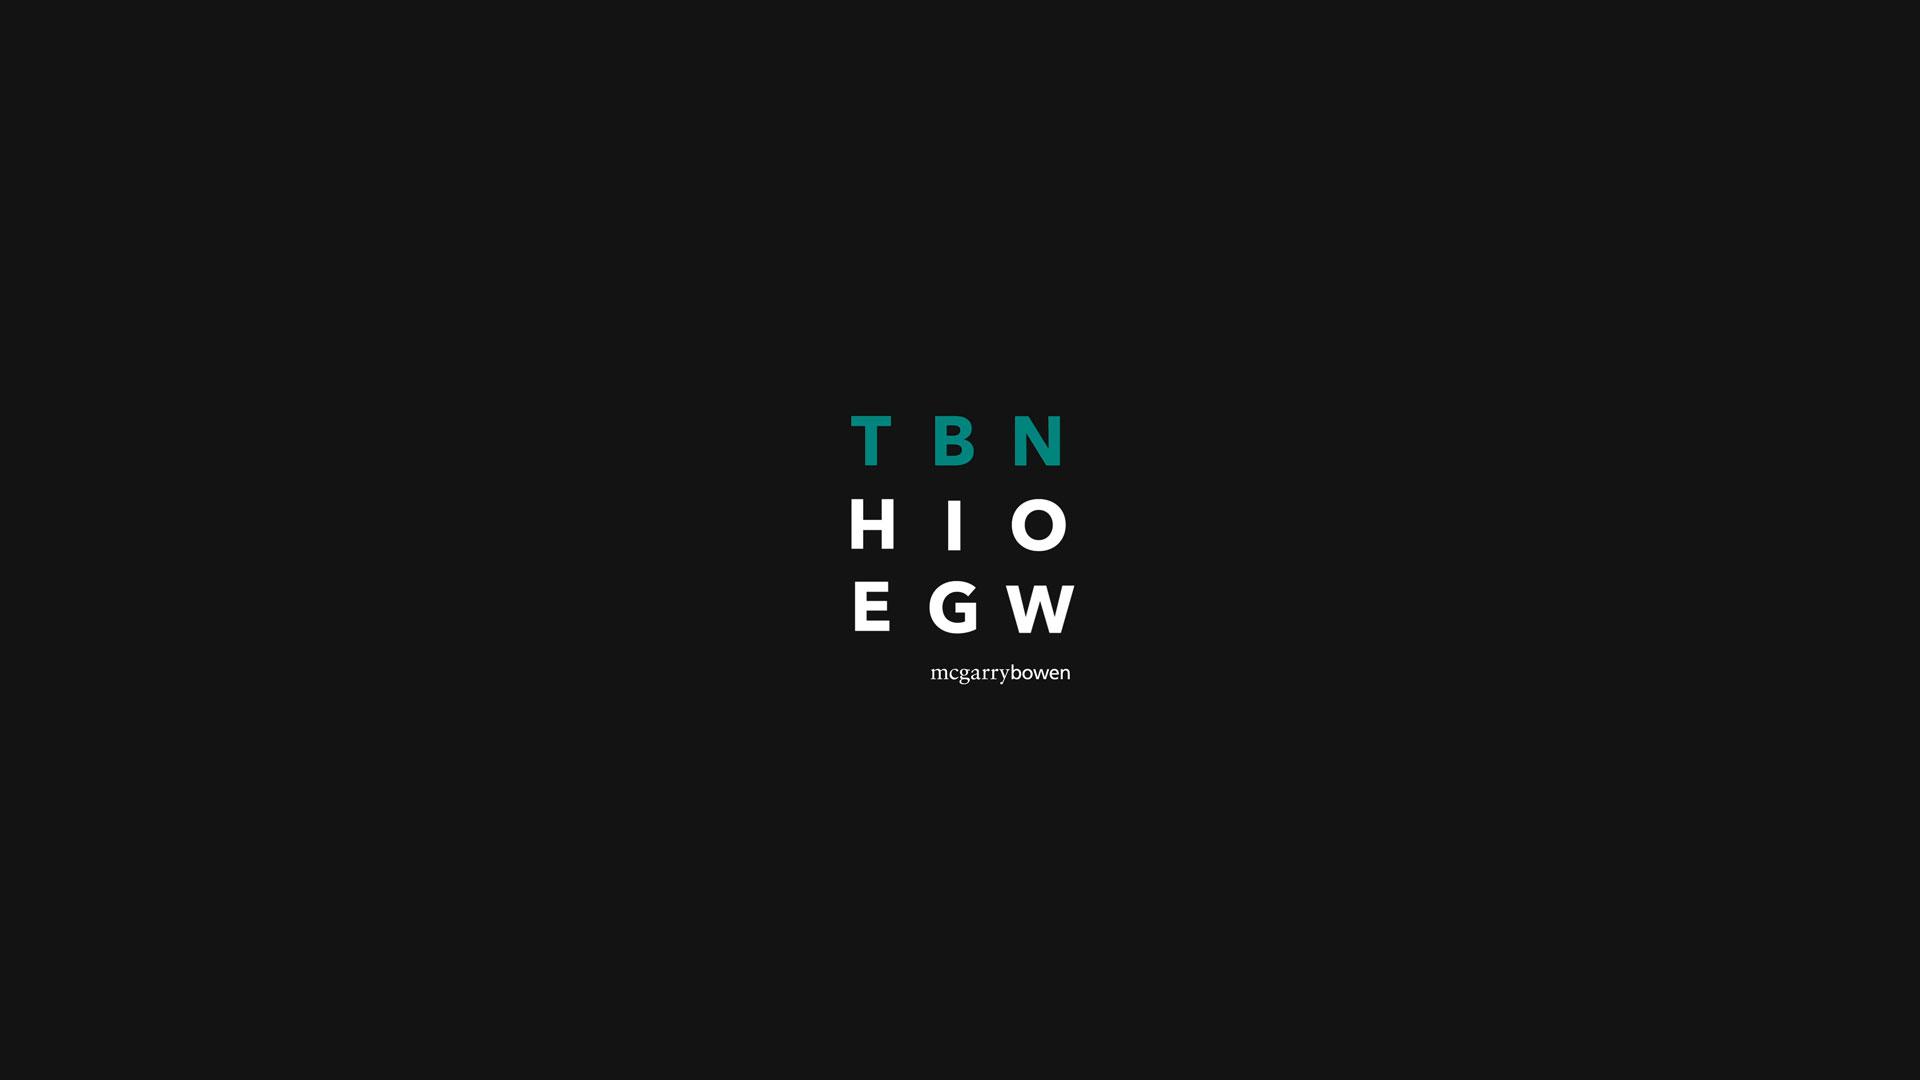 https://www.promotionmagazine.it/wp/wp-content/uploads/2020/01/Logo-The-Big-Now_mcgarrybowen.jpg